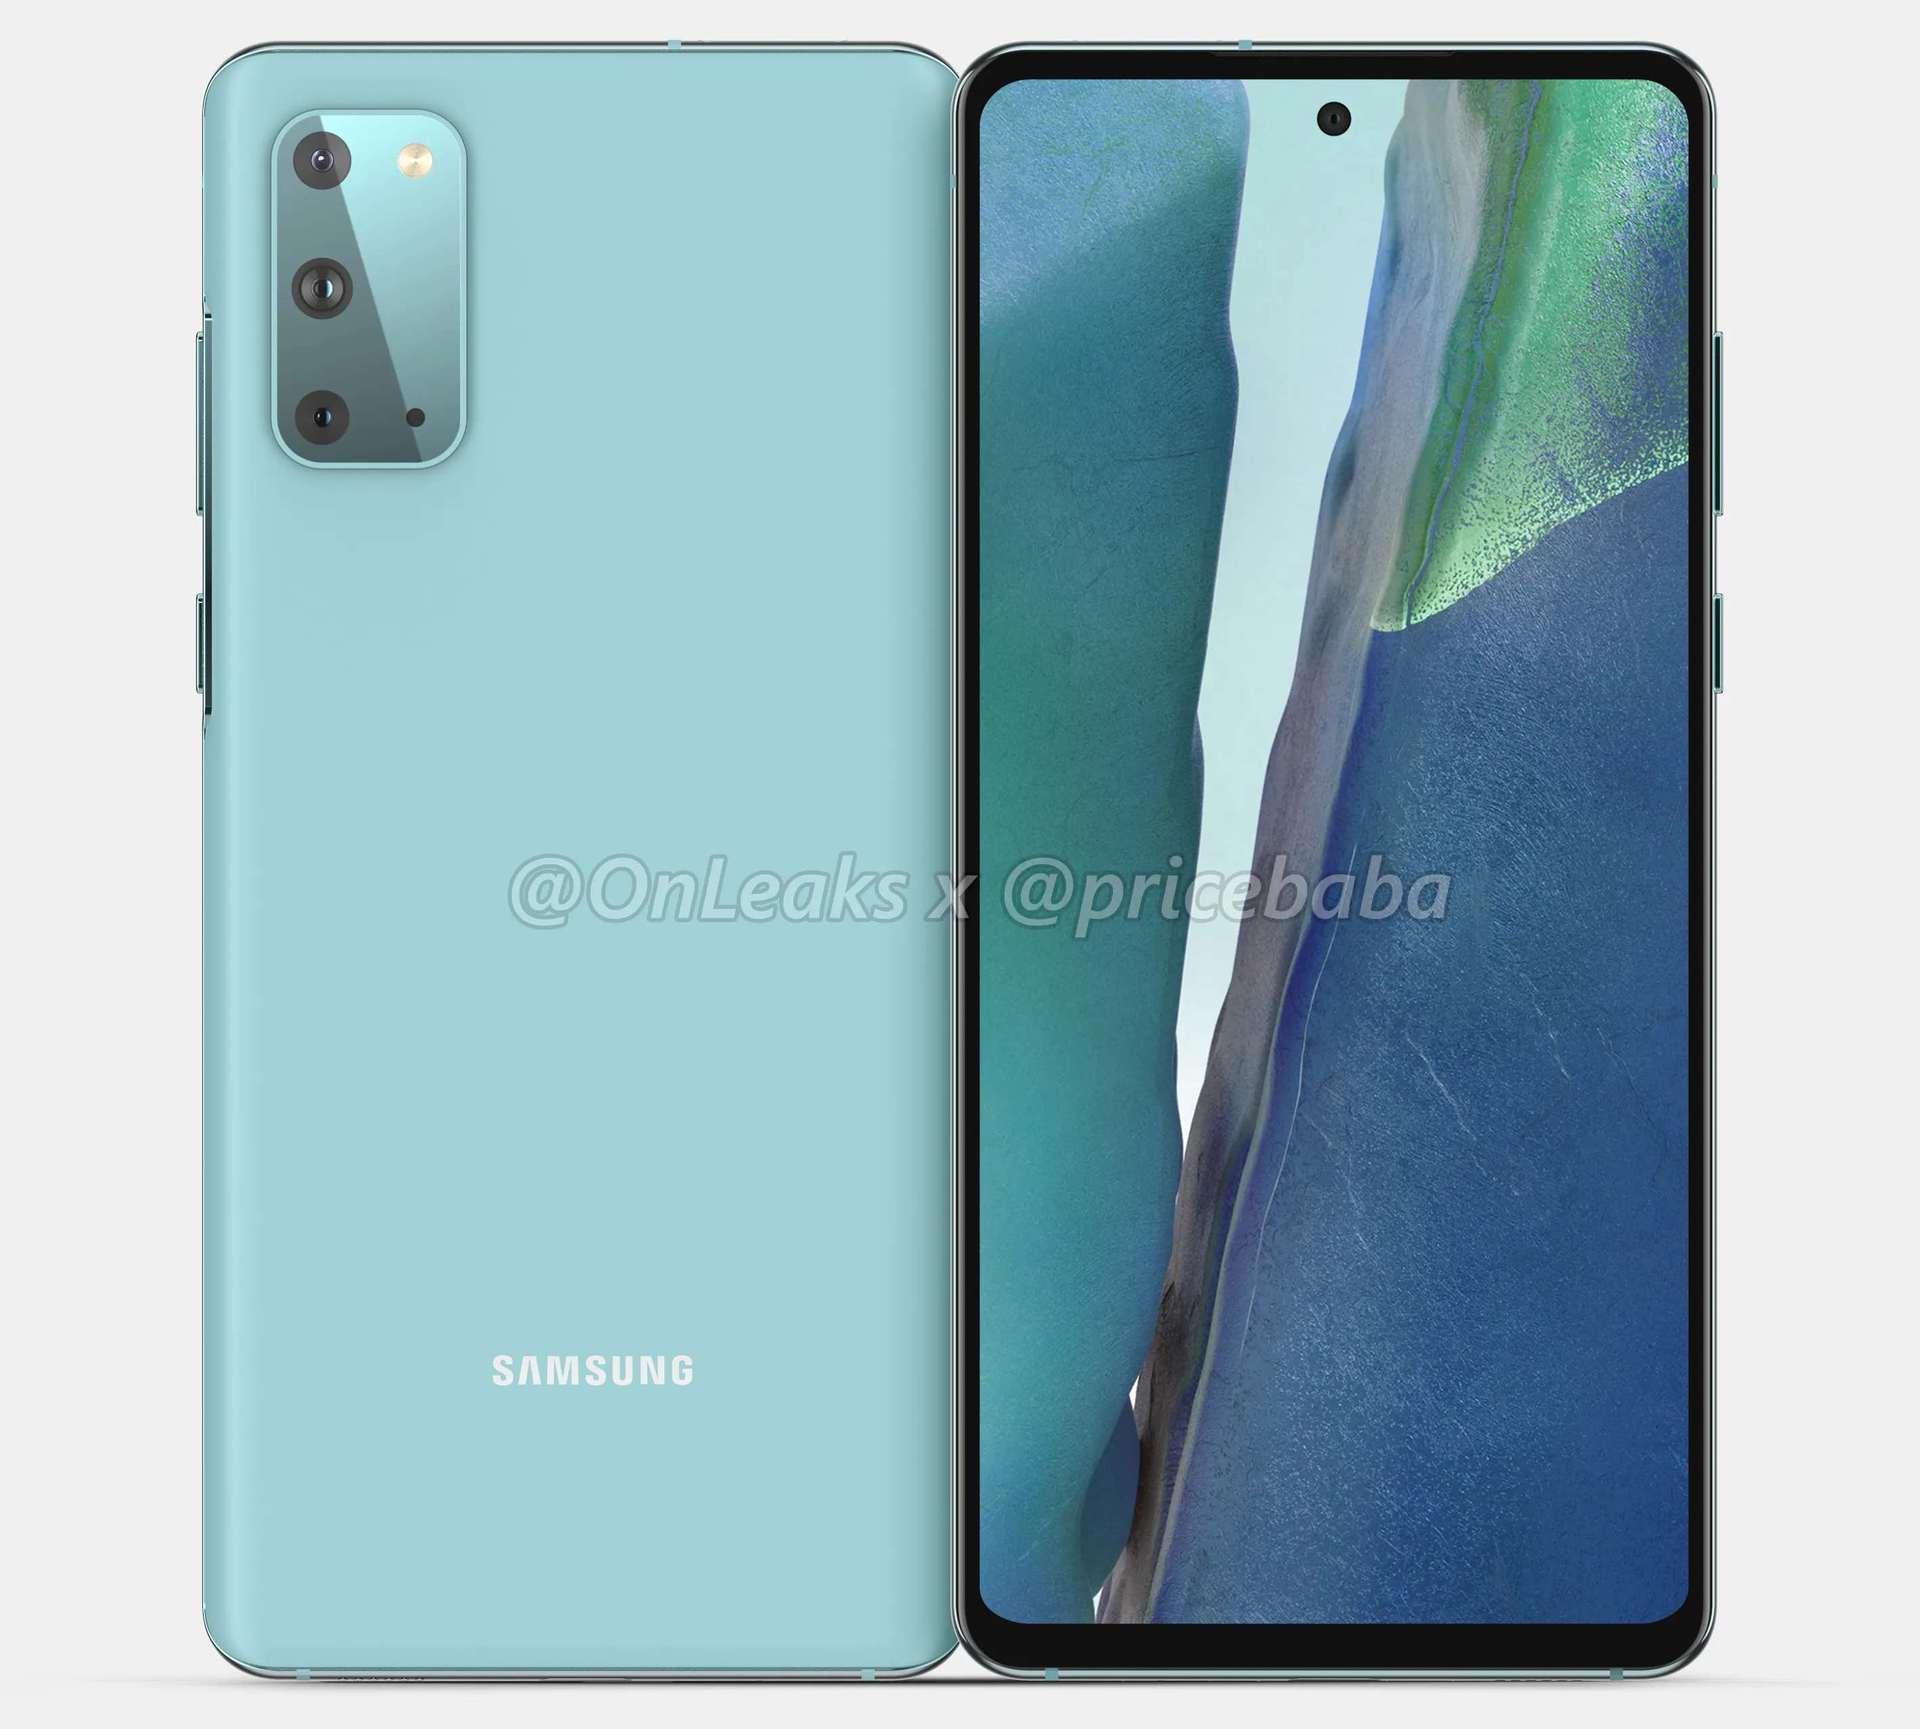 Samsung Galaxy S20 FE pricebaba 1